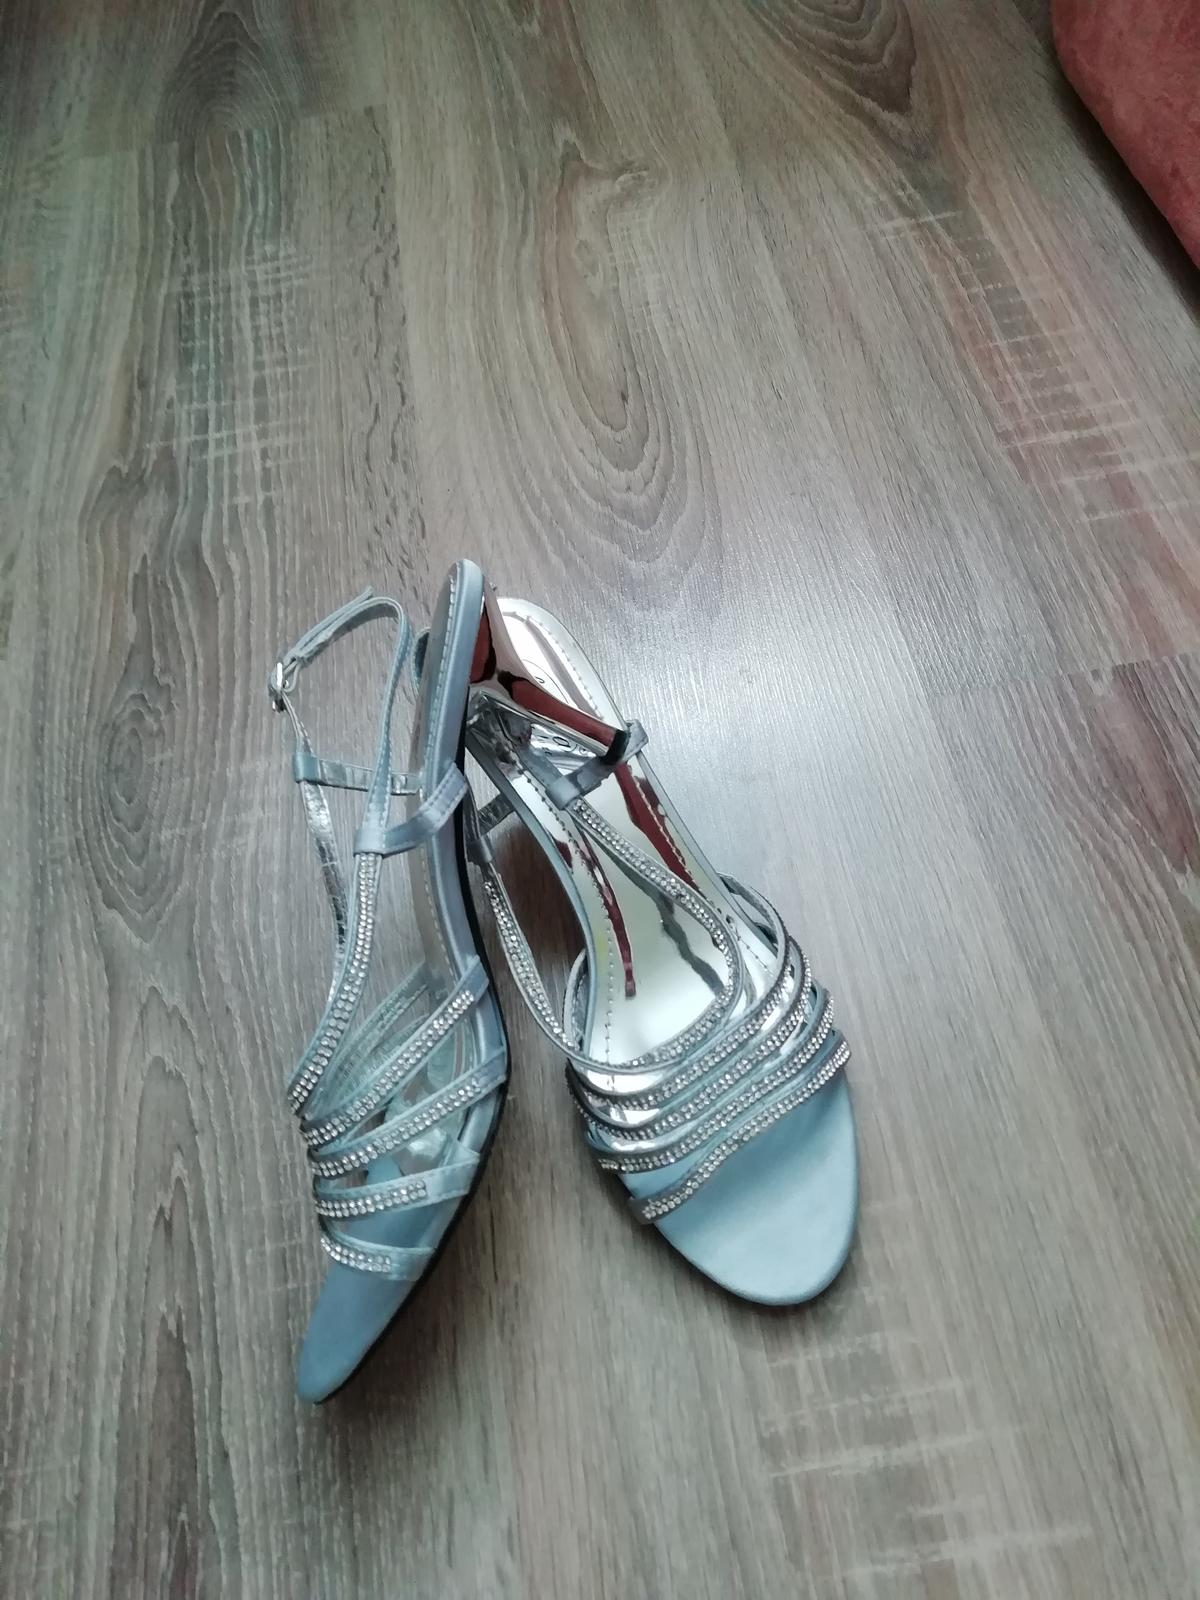 Spoločenské sandále - Obrázok č. 4